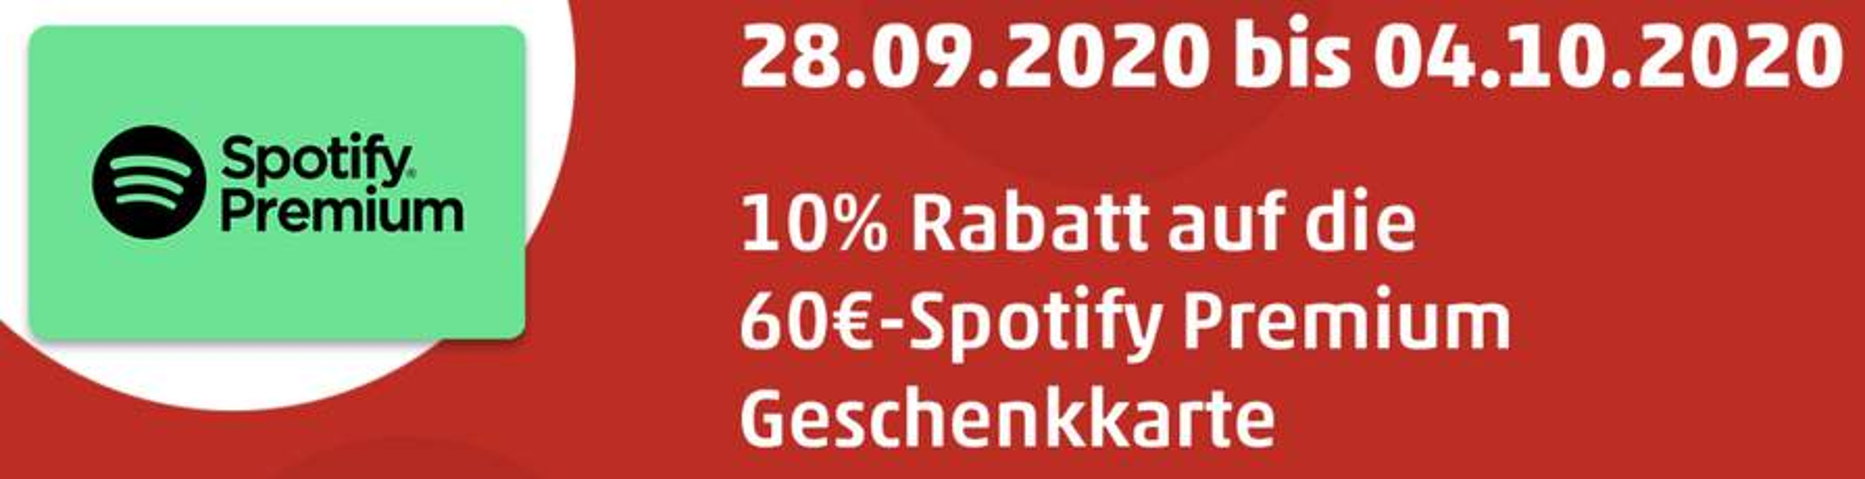 Spotify Premium Buchen